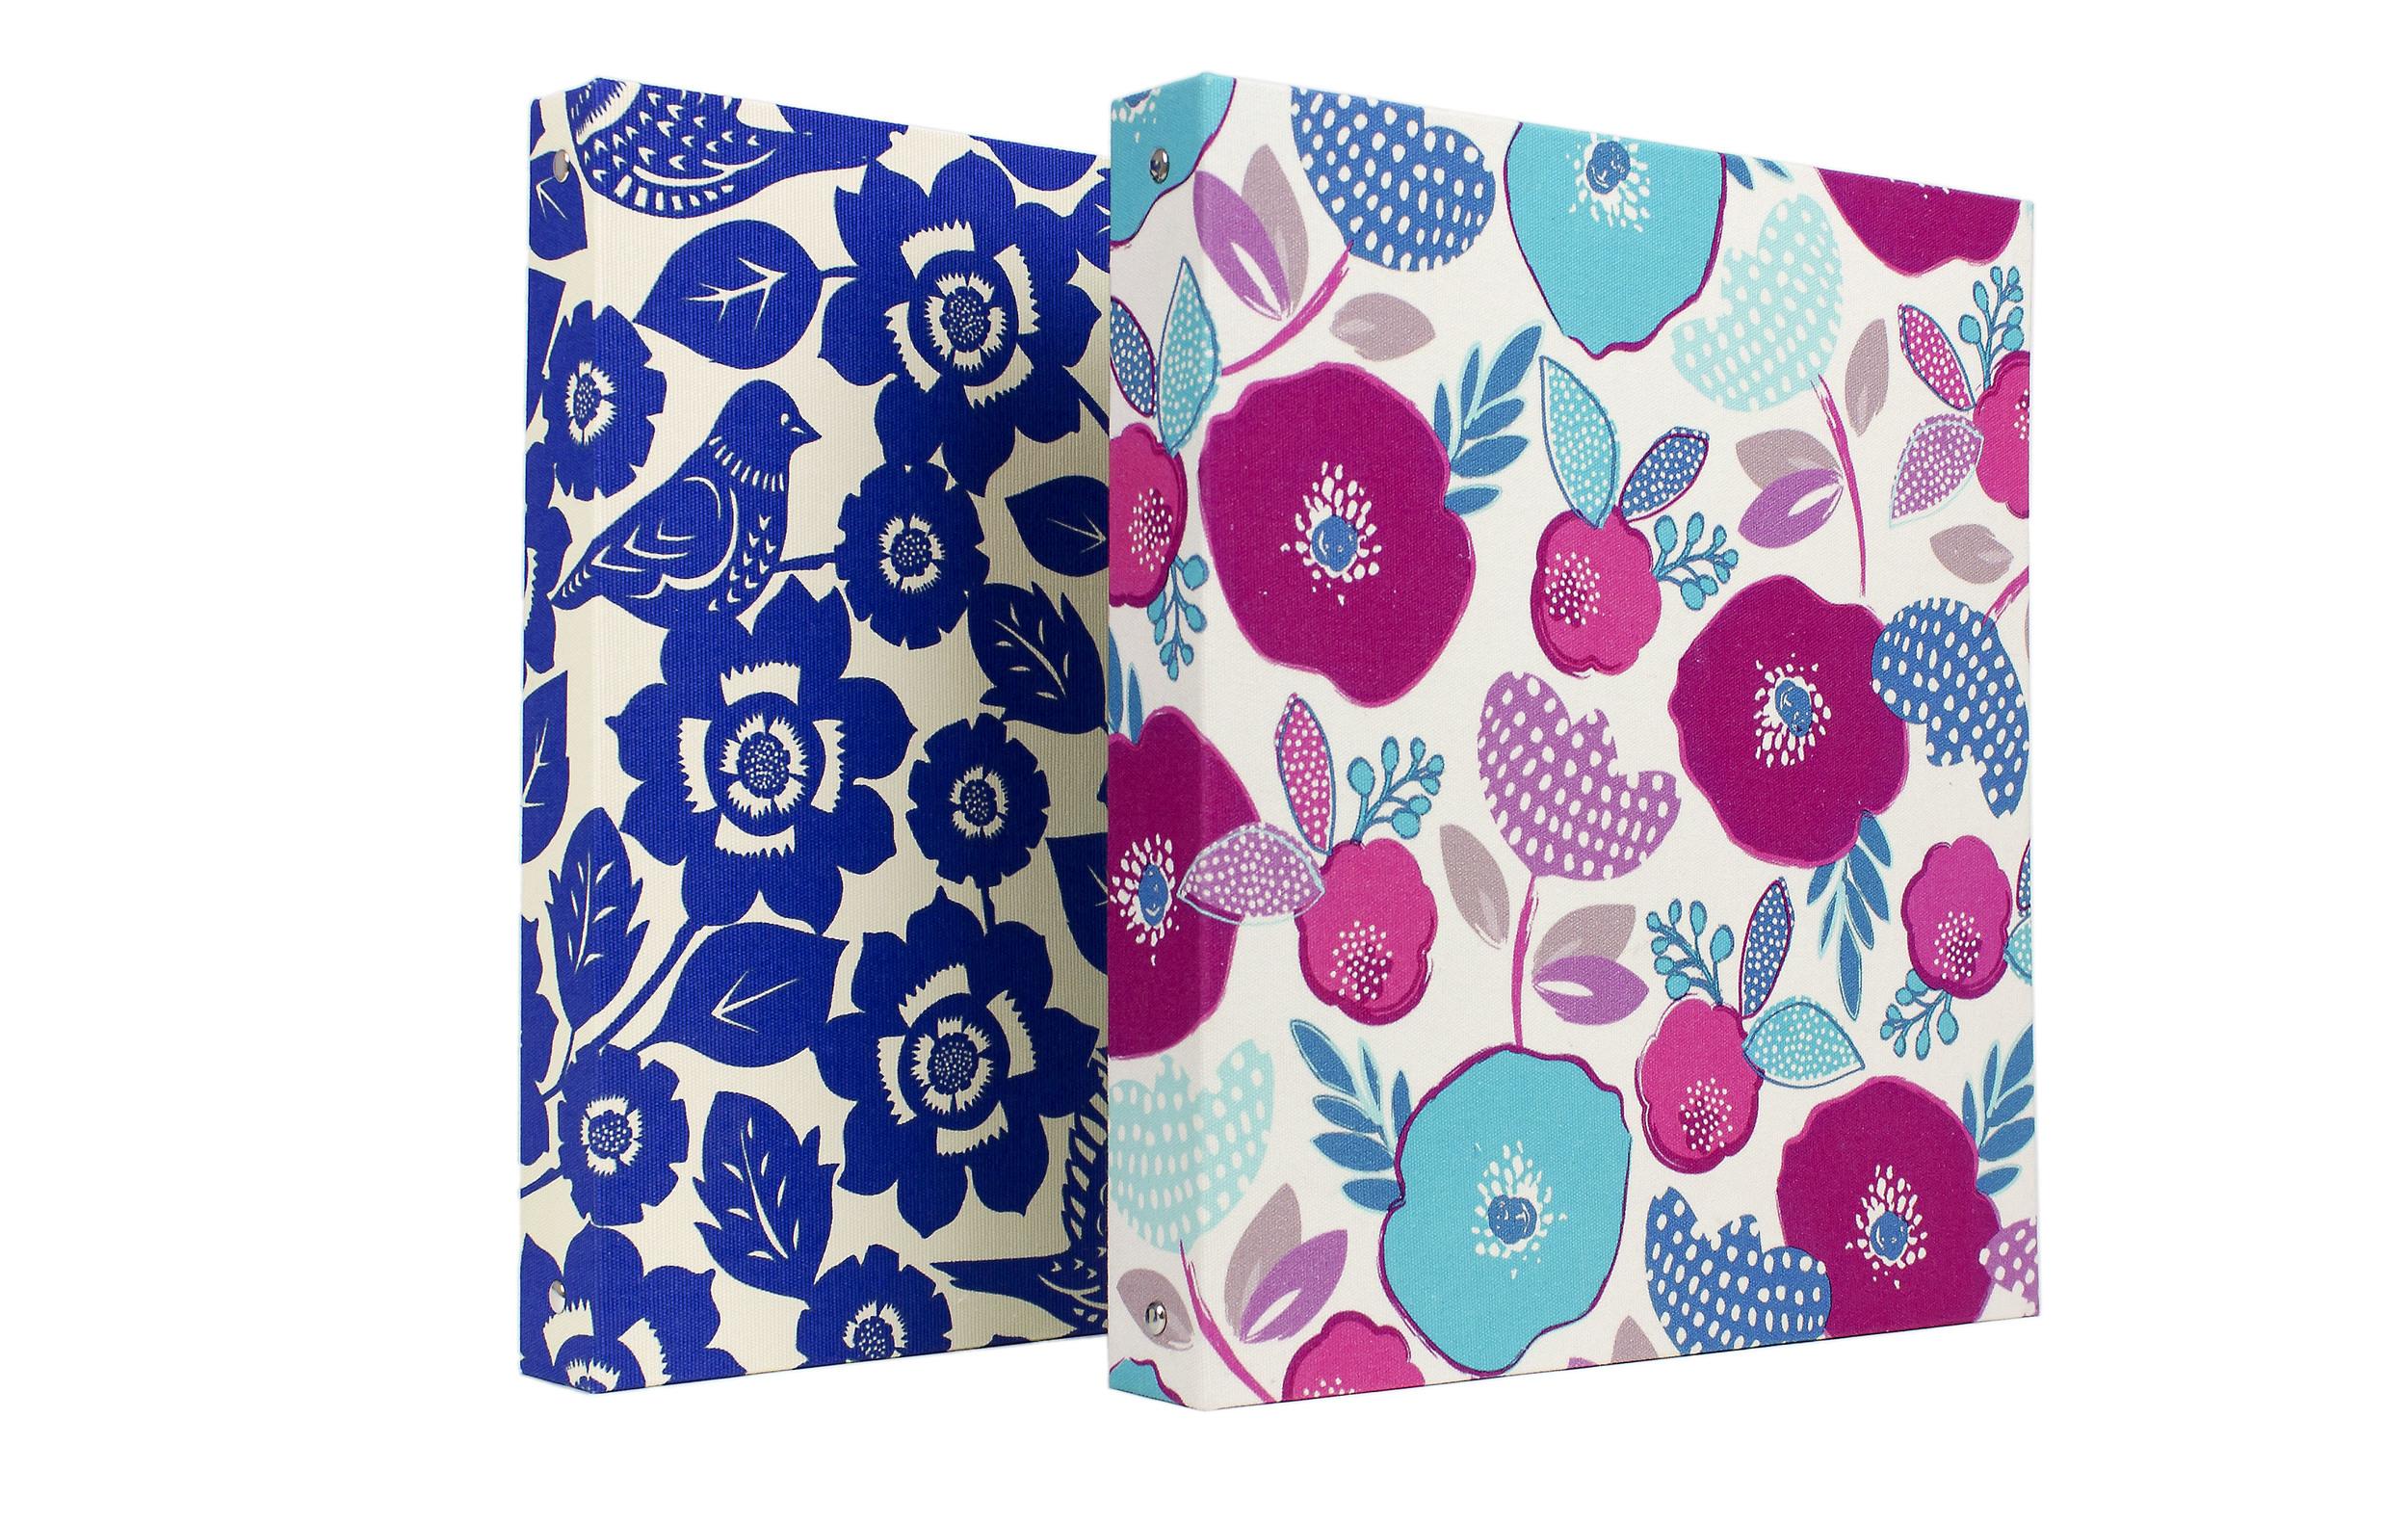 "1"" Ring Binder - Fabric // Greenroom, available at Target"